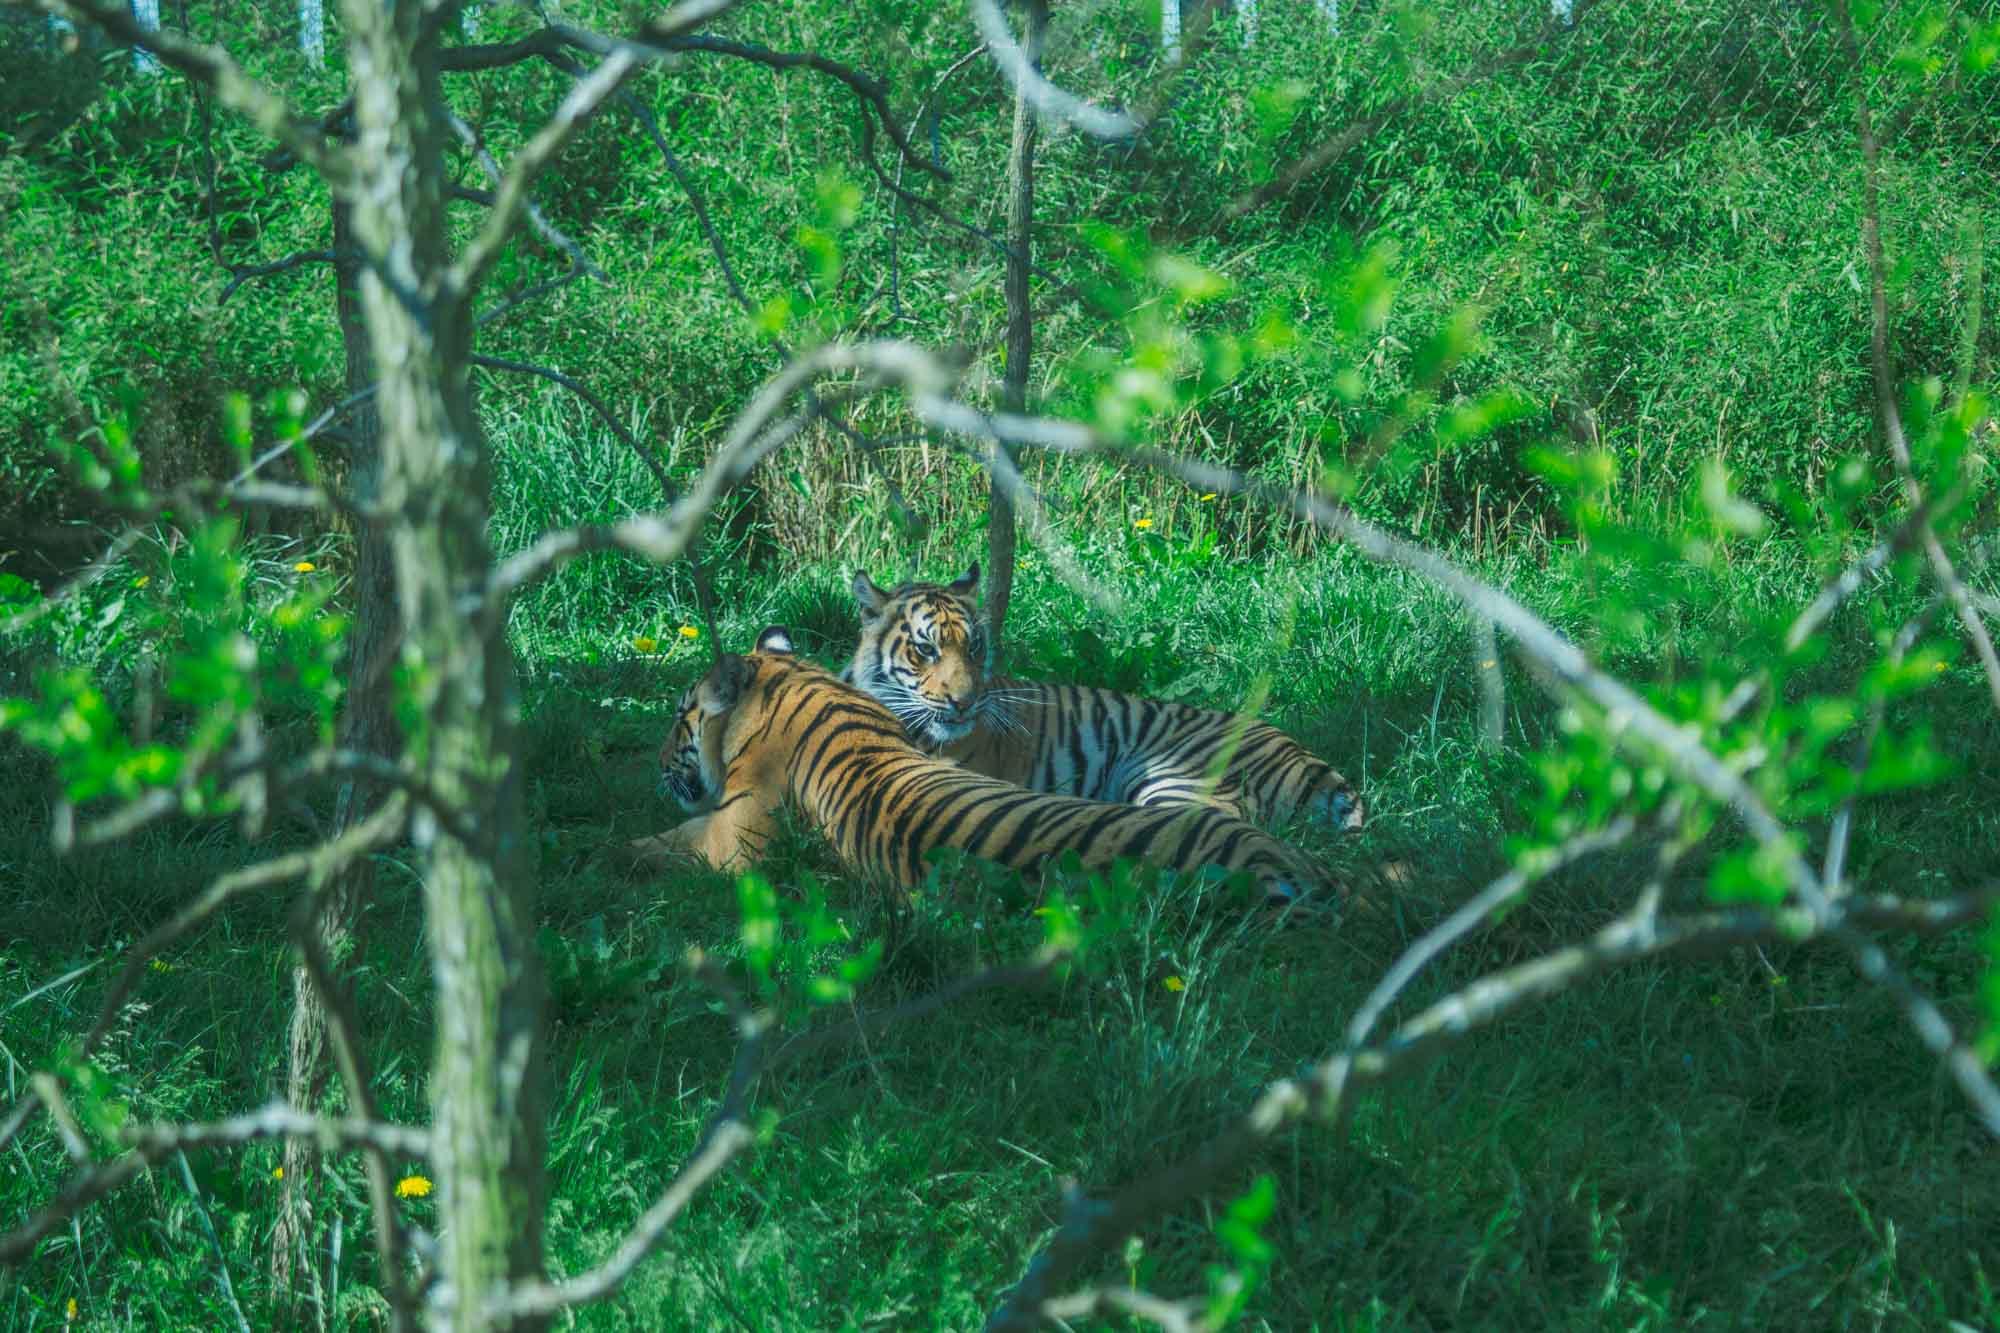 London Zoo ZSL - Tigers